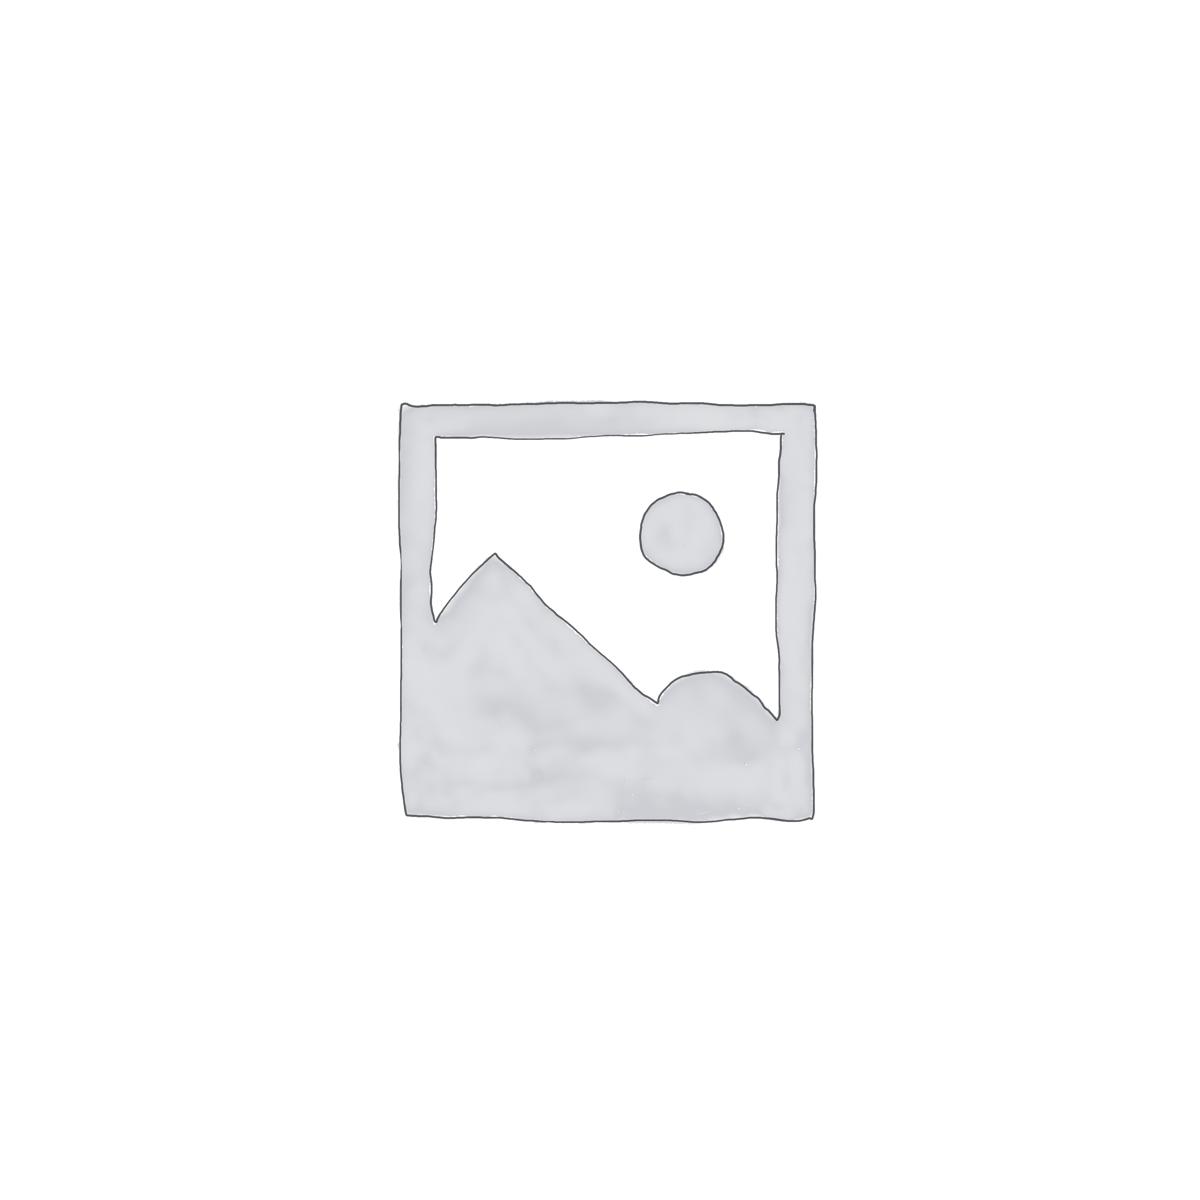 Green Banana Leaves Wallpaper Mural